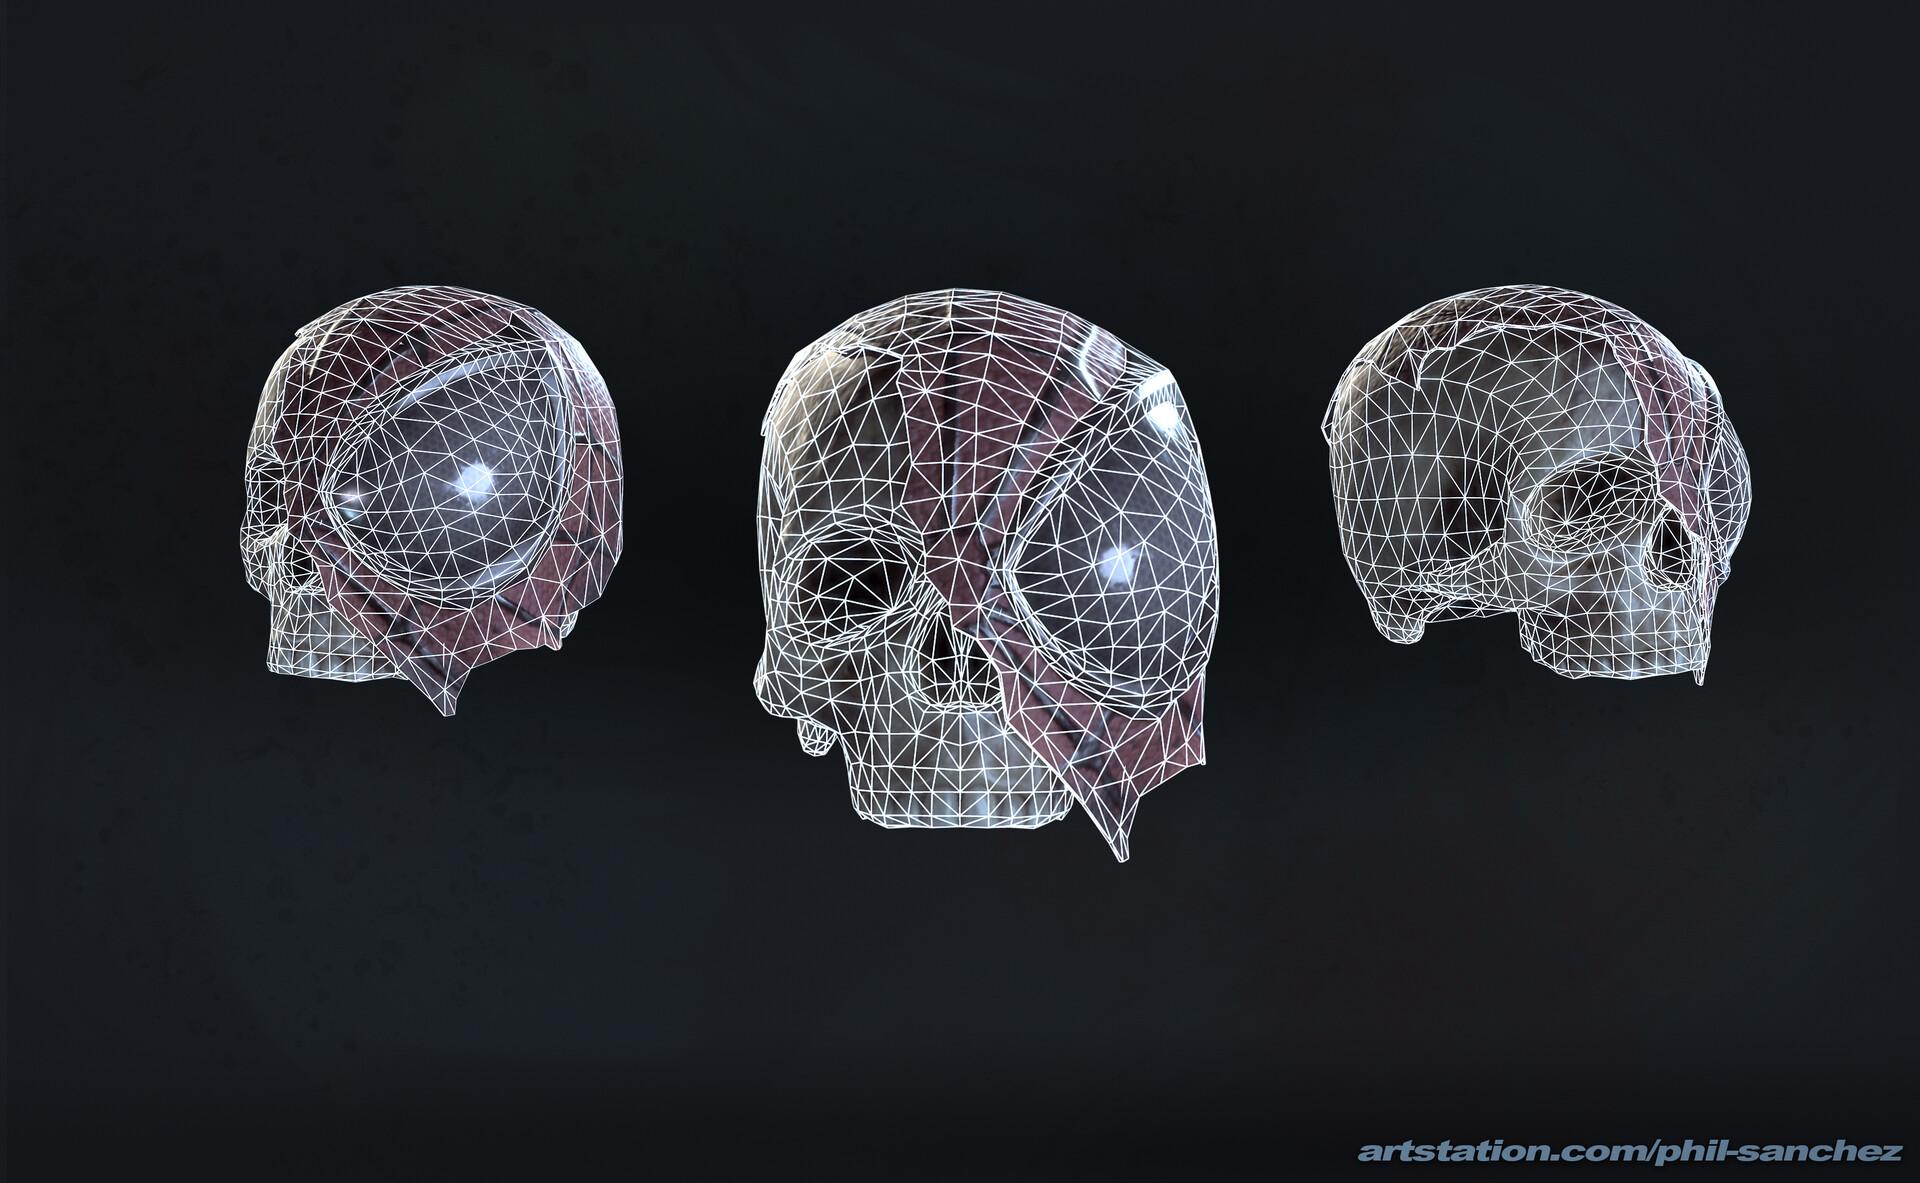 Philip sanchez venom skulldetail2b